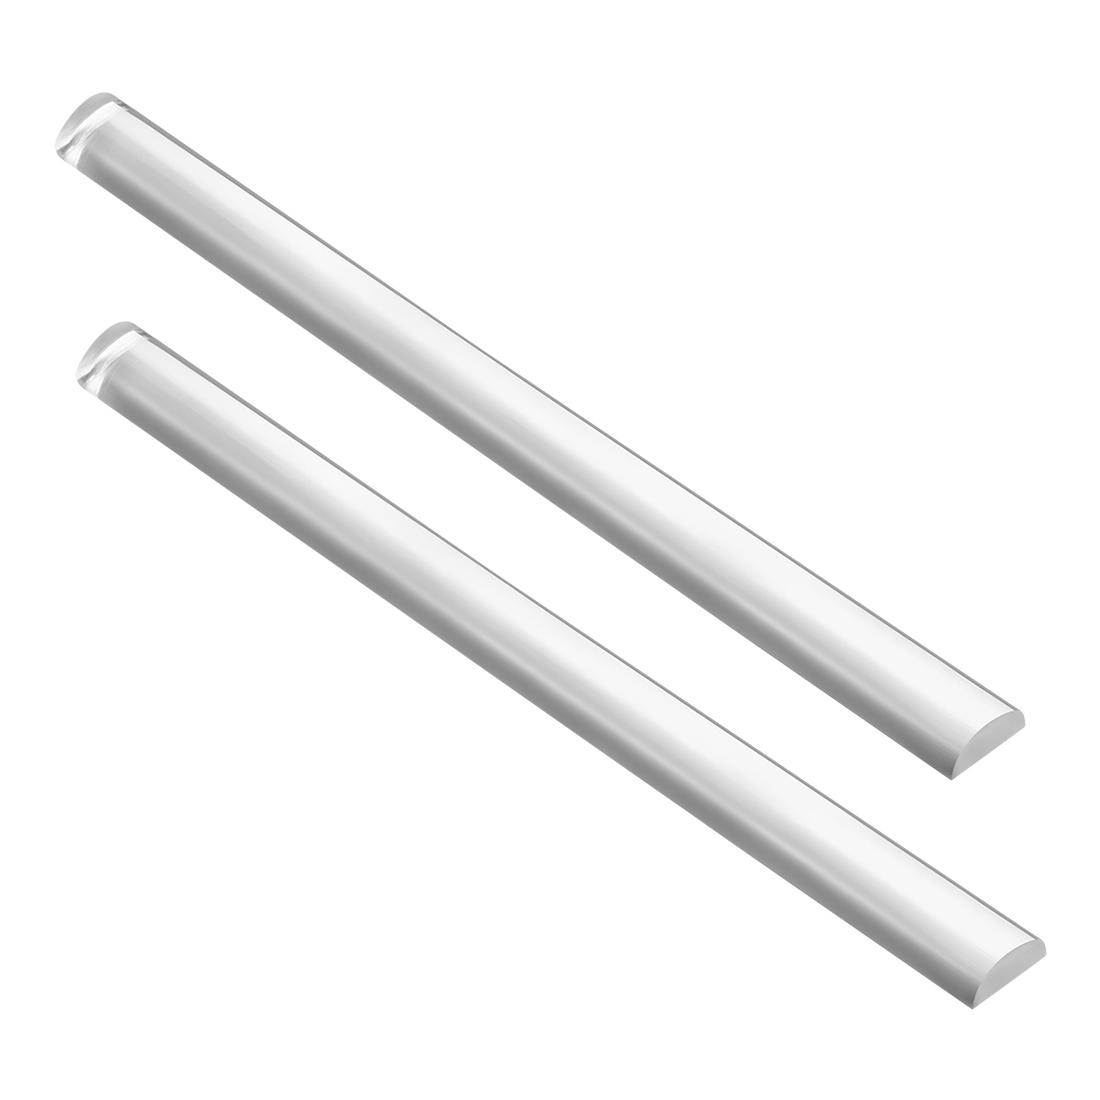 "20mmx10mm 10"" Long Solid Acrylic Half Round Bar PMMA Rod Clear 2pcs"